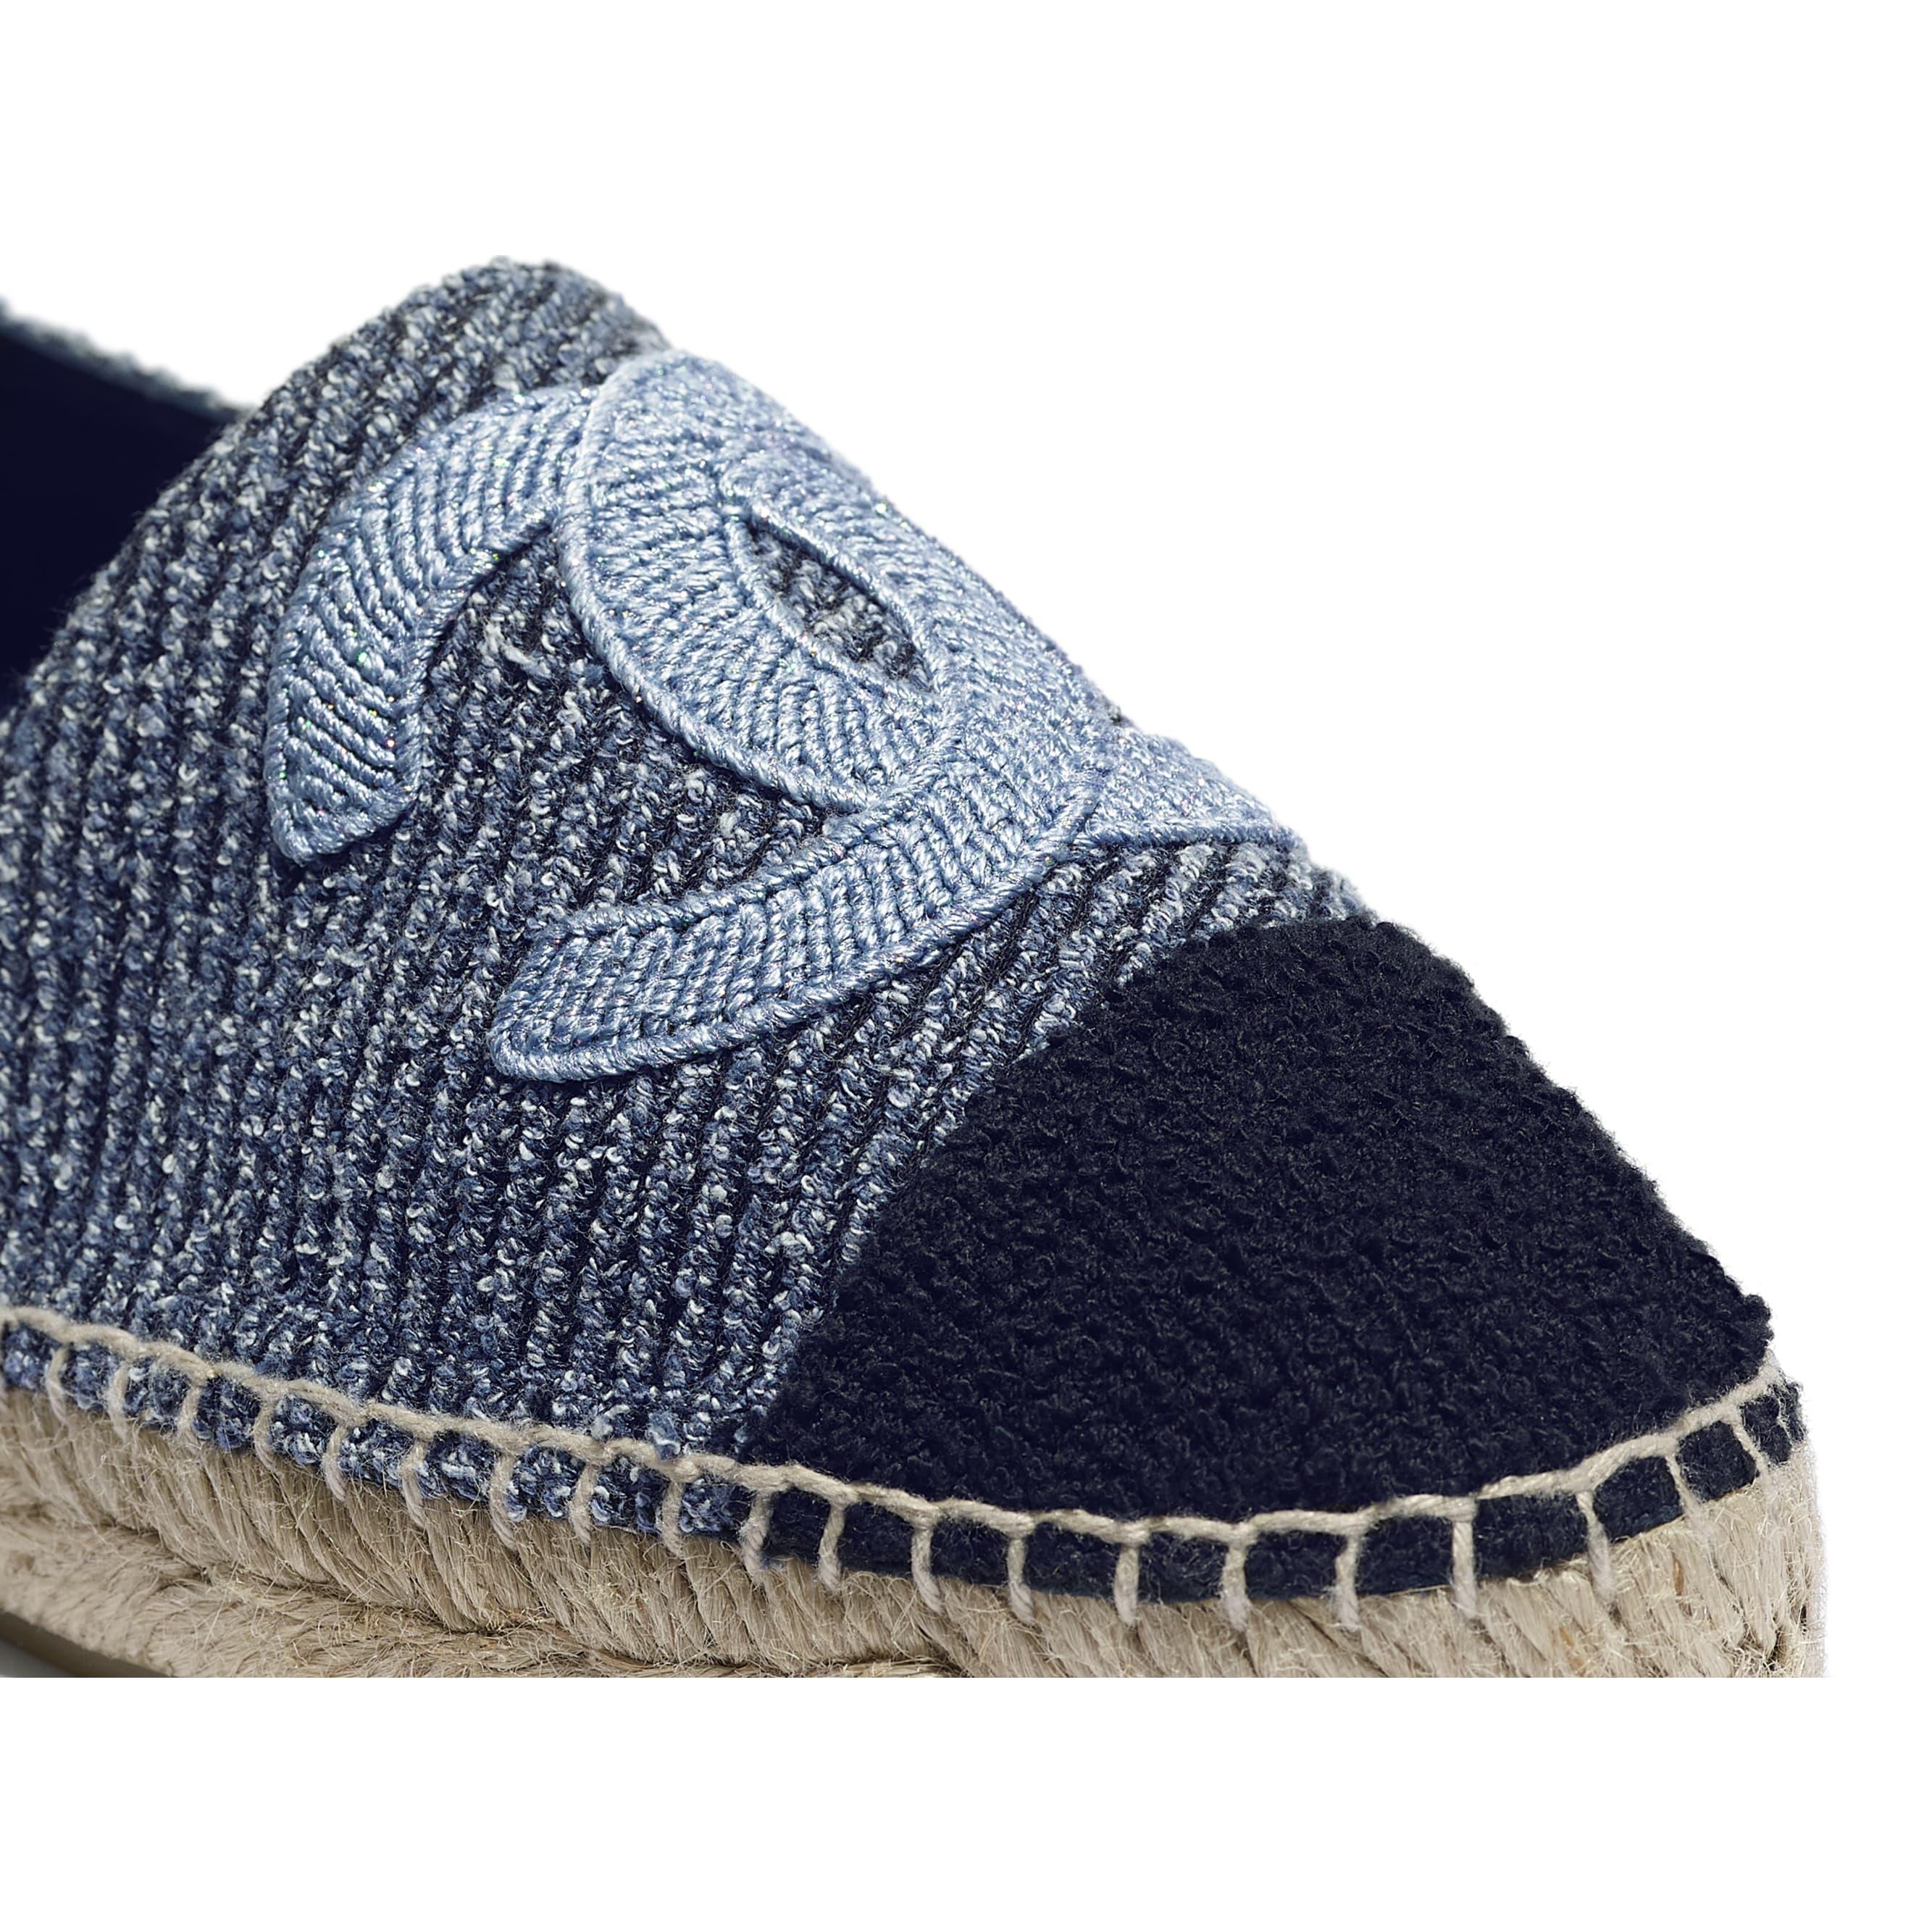 Espadrilles - Blue, Ecru & Black - Cotton Tweed - CHANEL - Extra view - see standard sized version